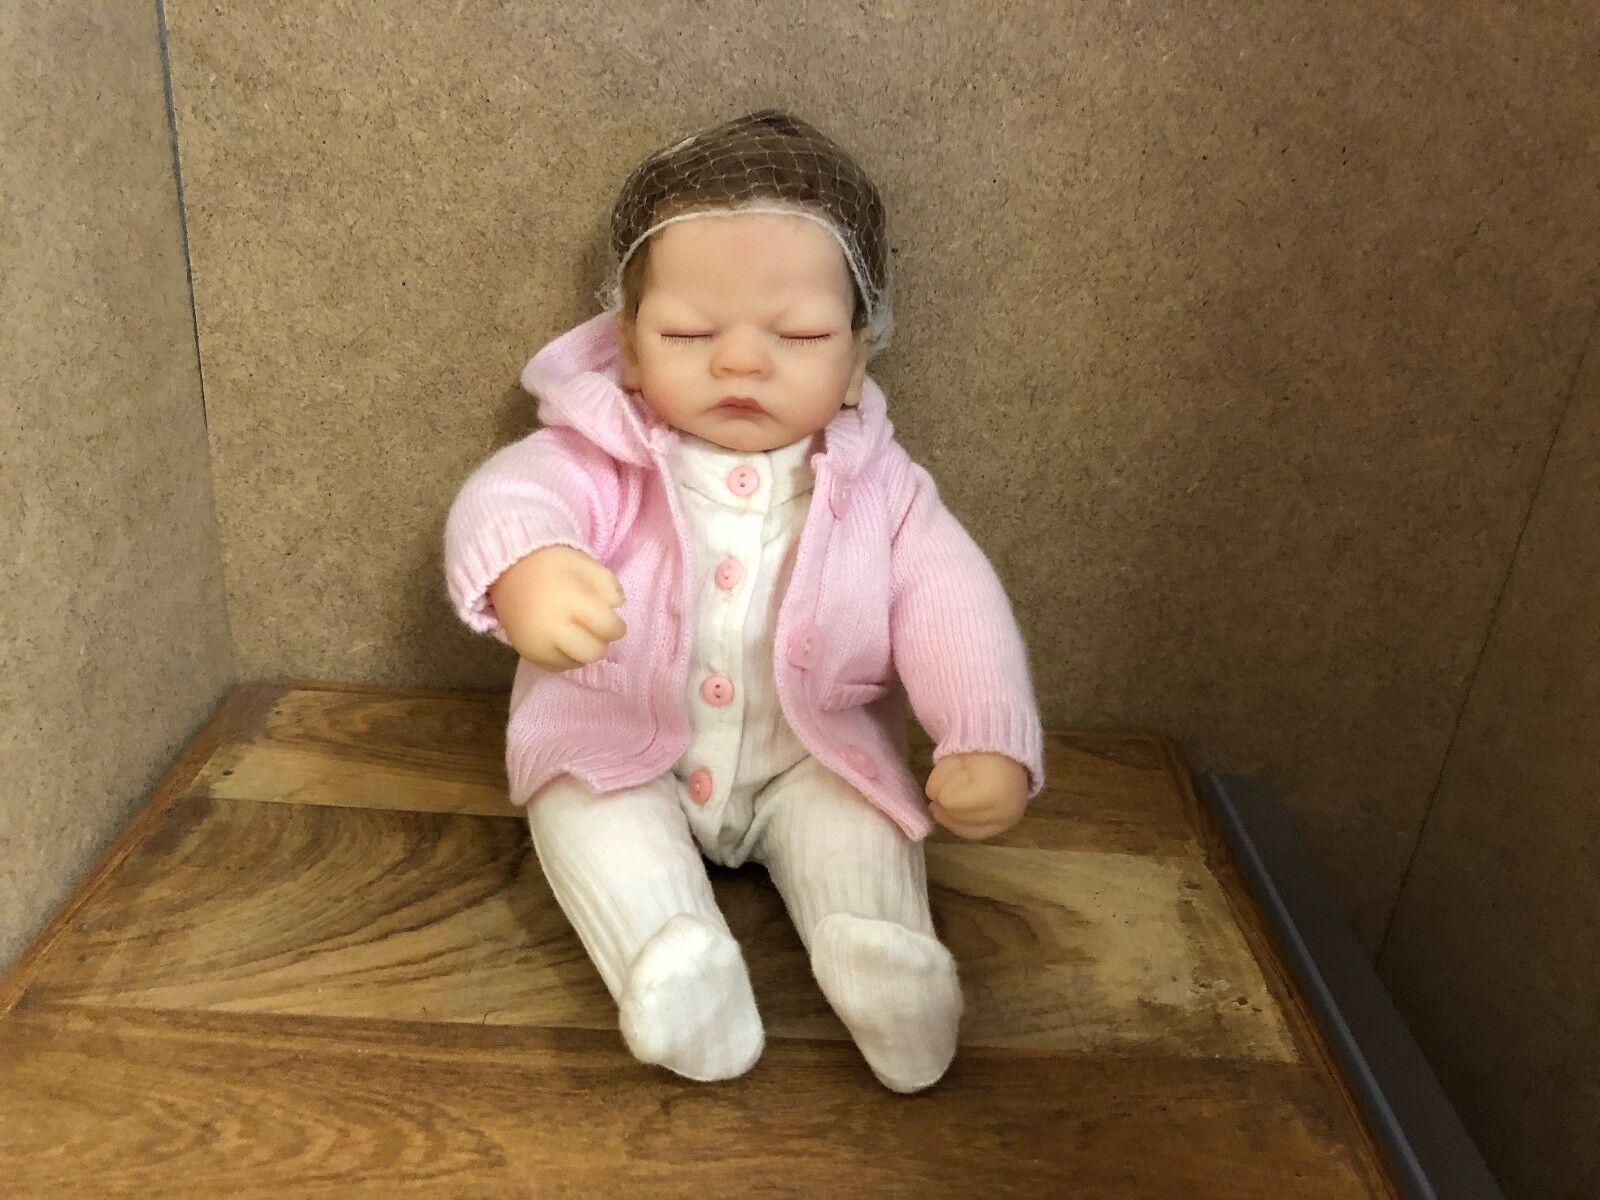 Linda Webb muñeca de vinilo 26 cm. top estado